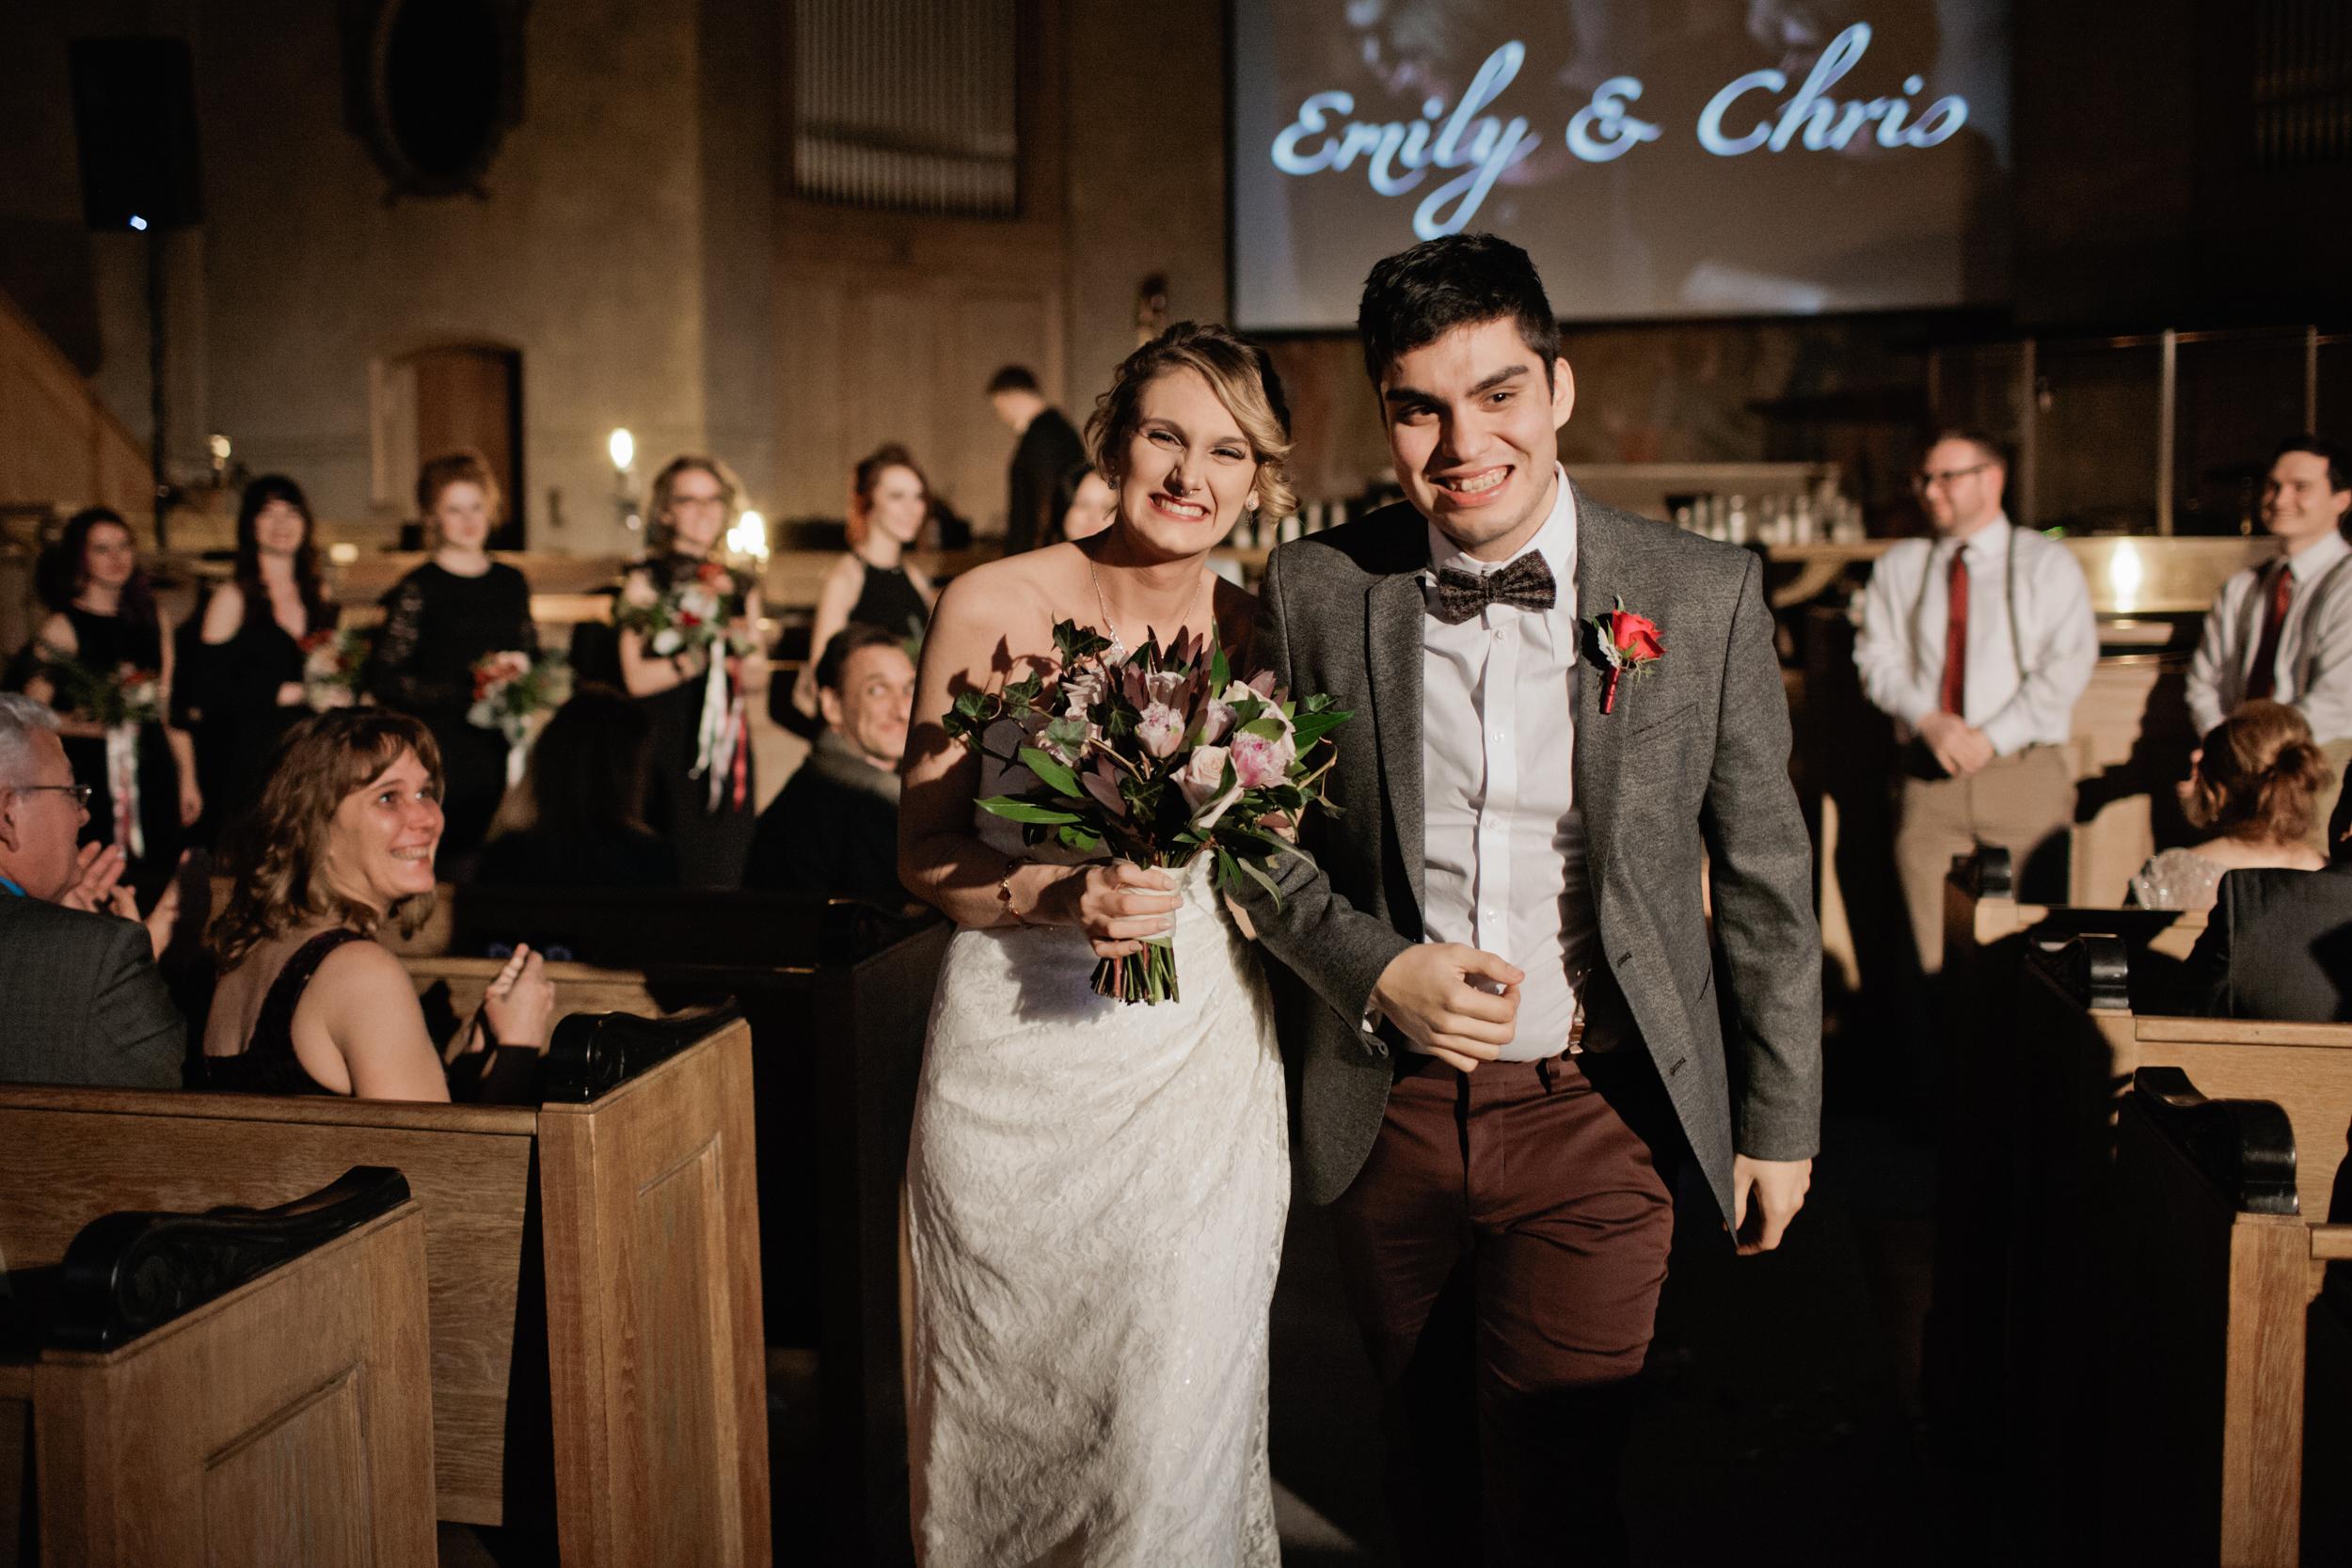 providence-wedding-photographer-106.jpg